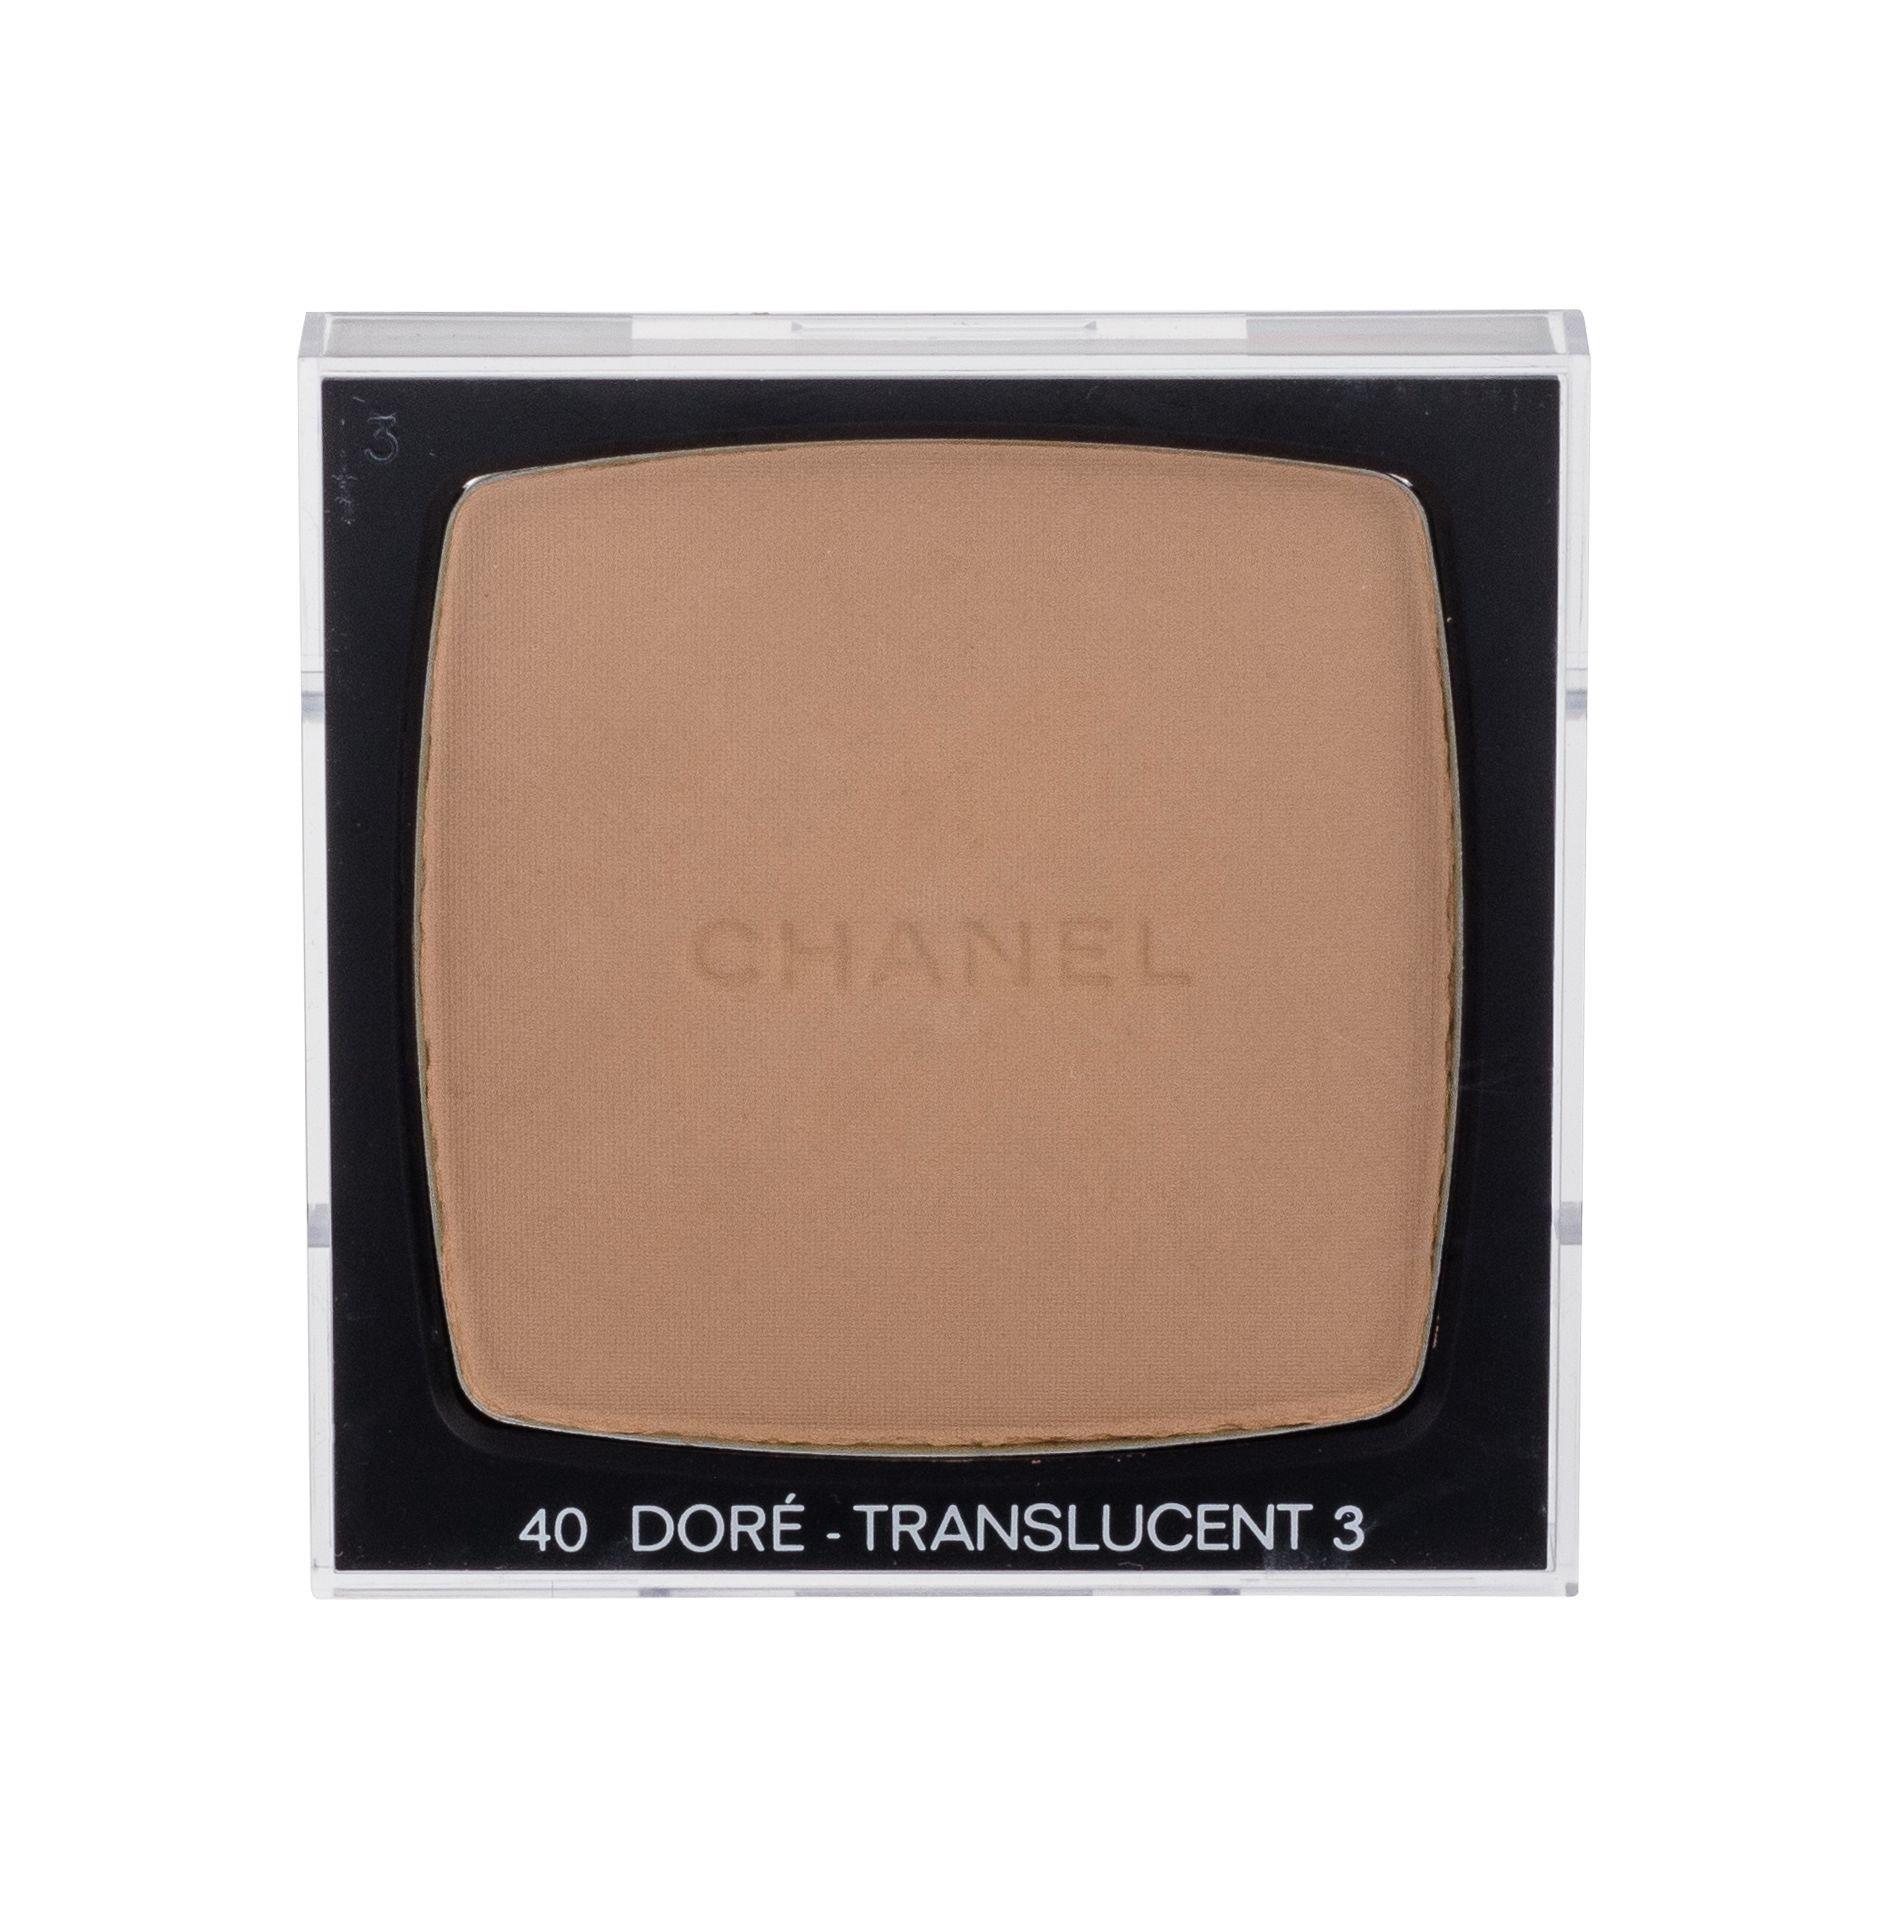 Chanel Poudre Universelle Compacte Powder 15ml 40 Dore